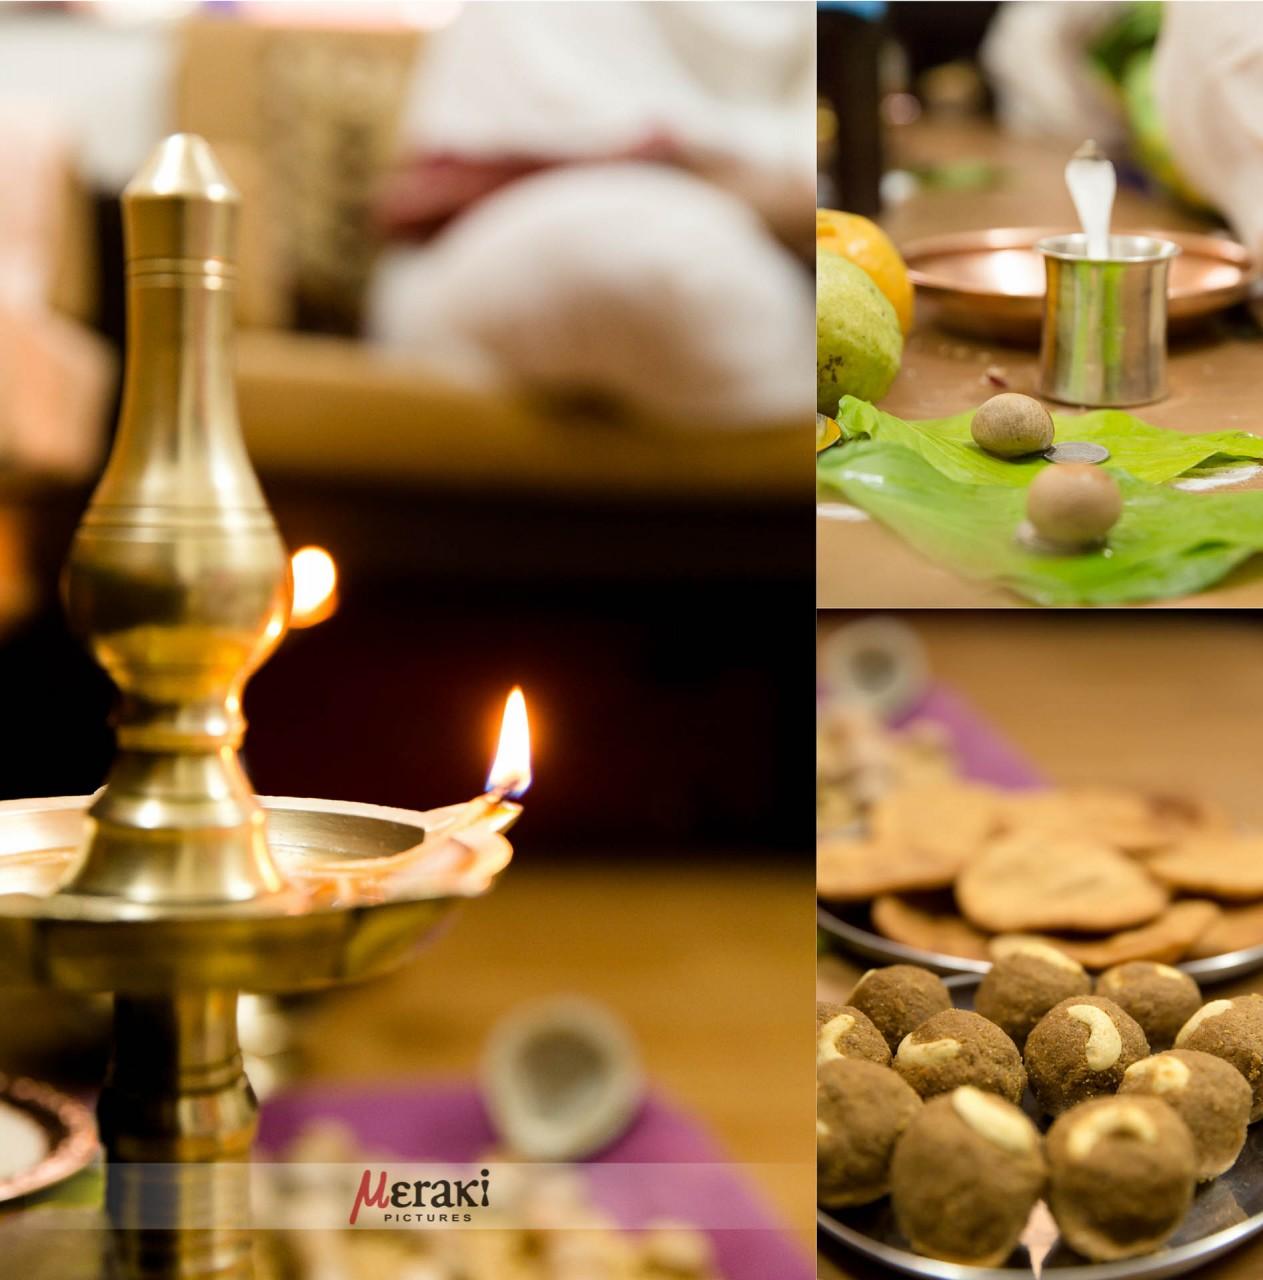 047-collage_04-Maithili_Ajinkya_prewedding-website